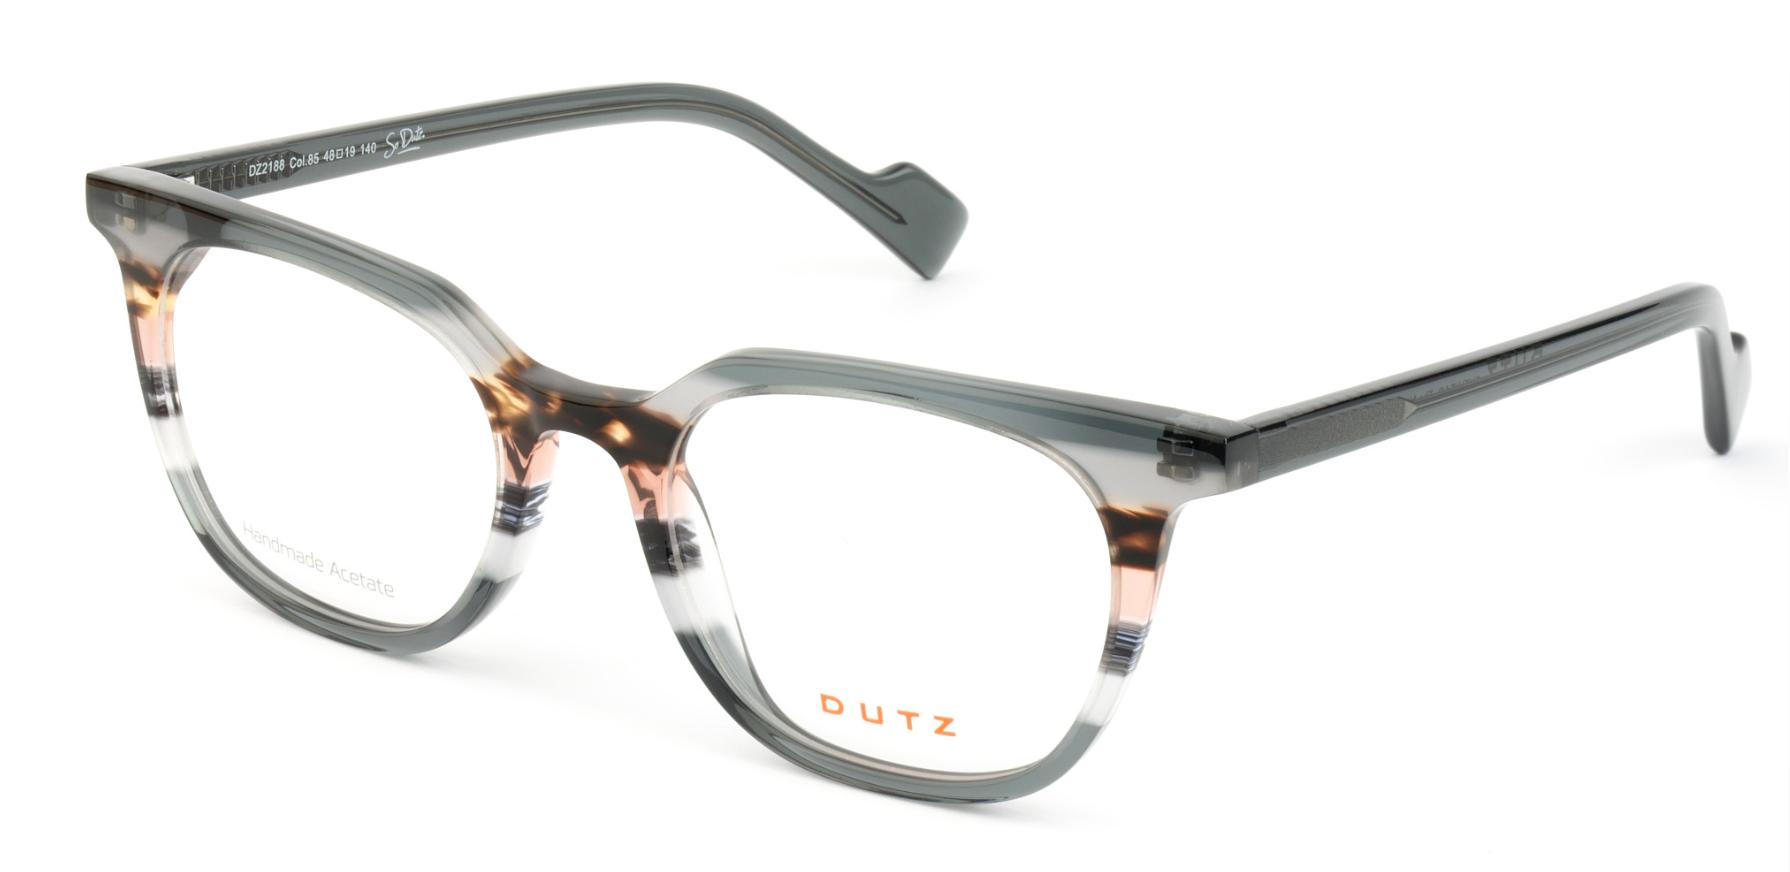 2cc35e7acd Dutz Eyewear at Optical Innovations KC 16